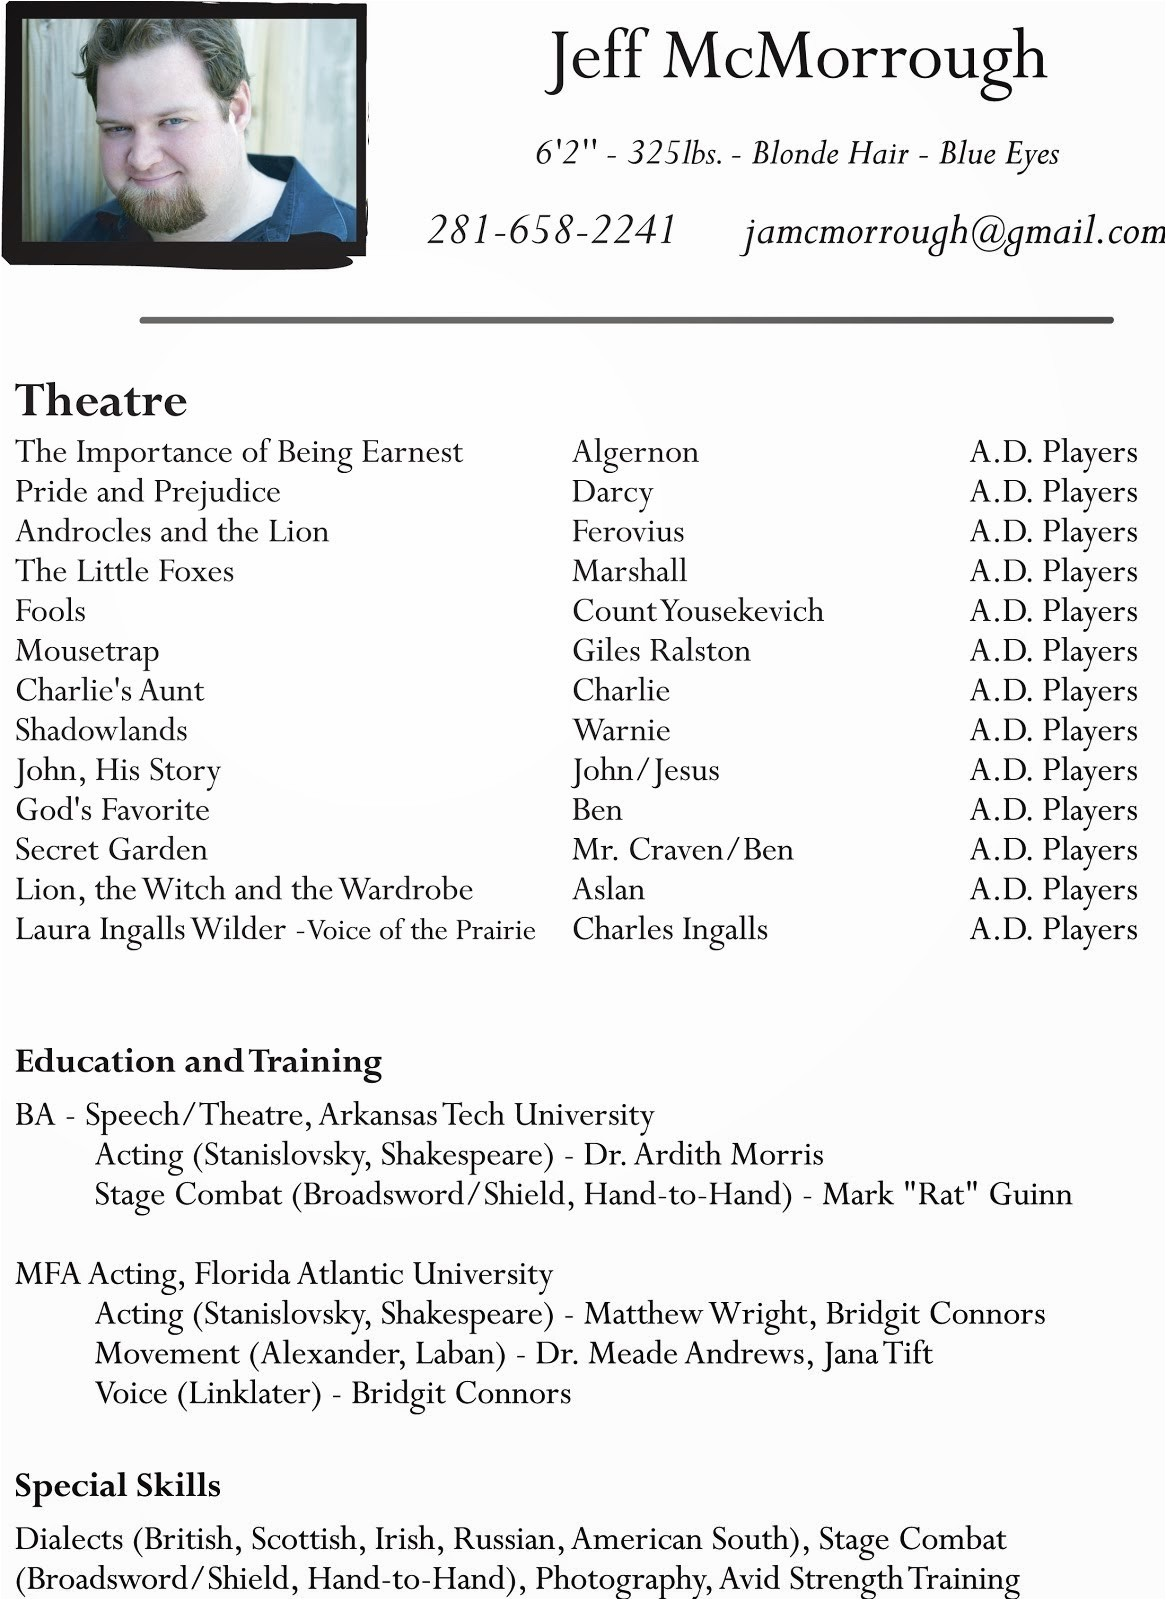 Child Modeling Resume Sample Talent Star Acting Resume Actor Beginner Kids theatre